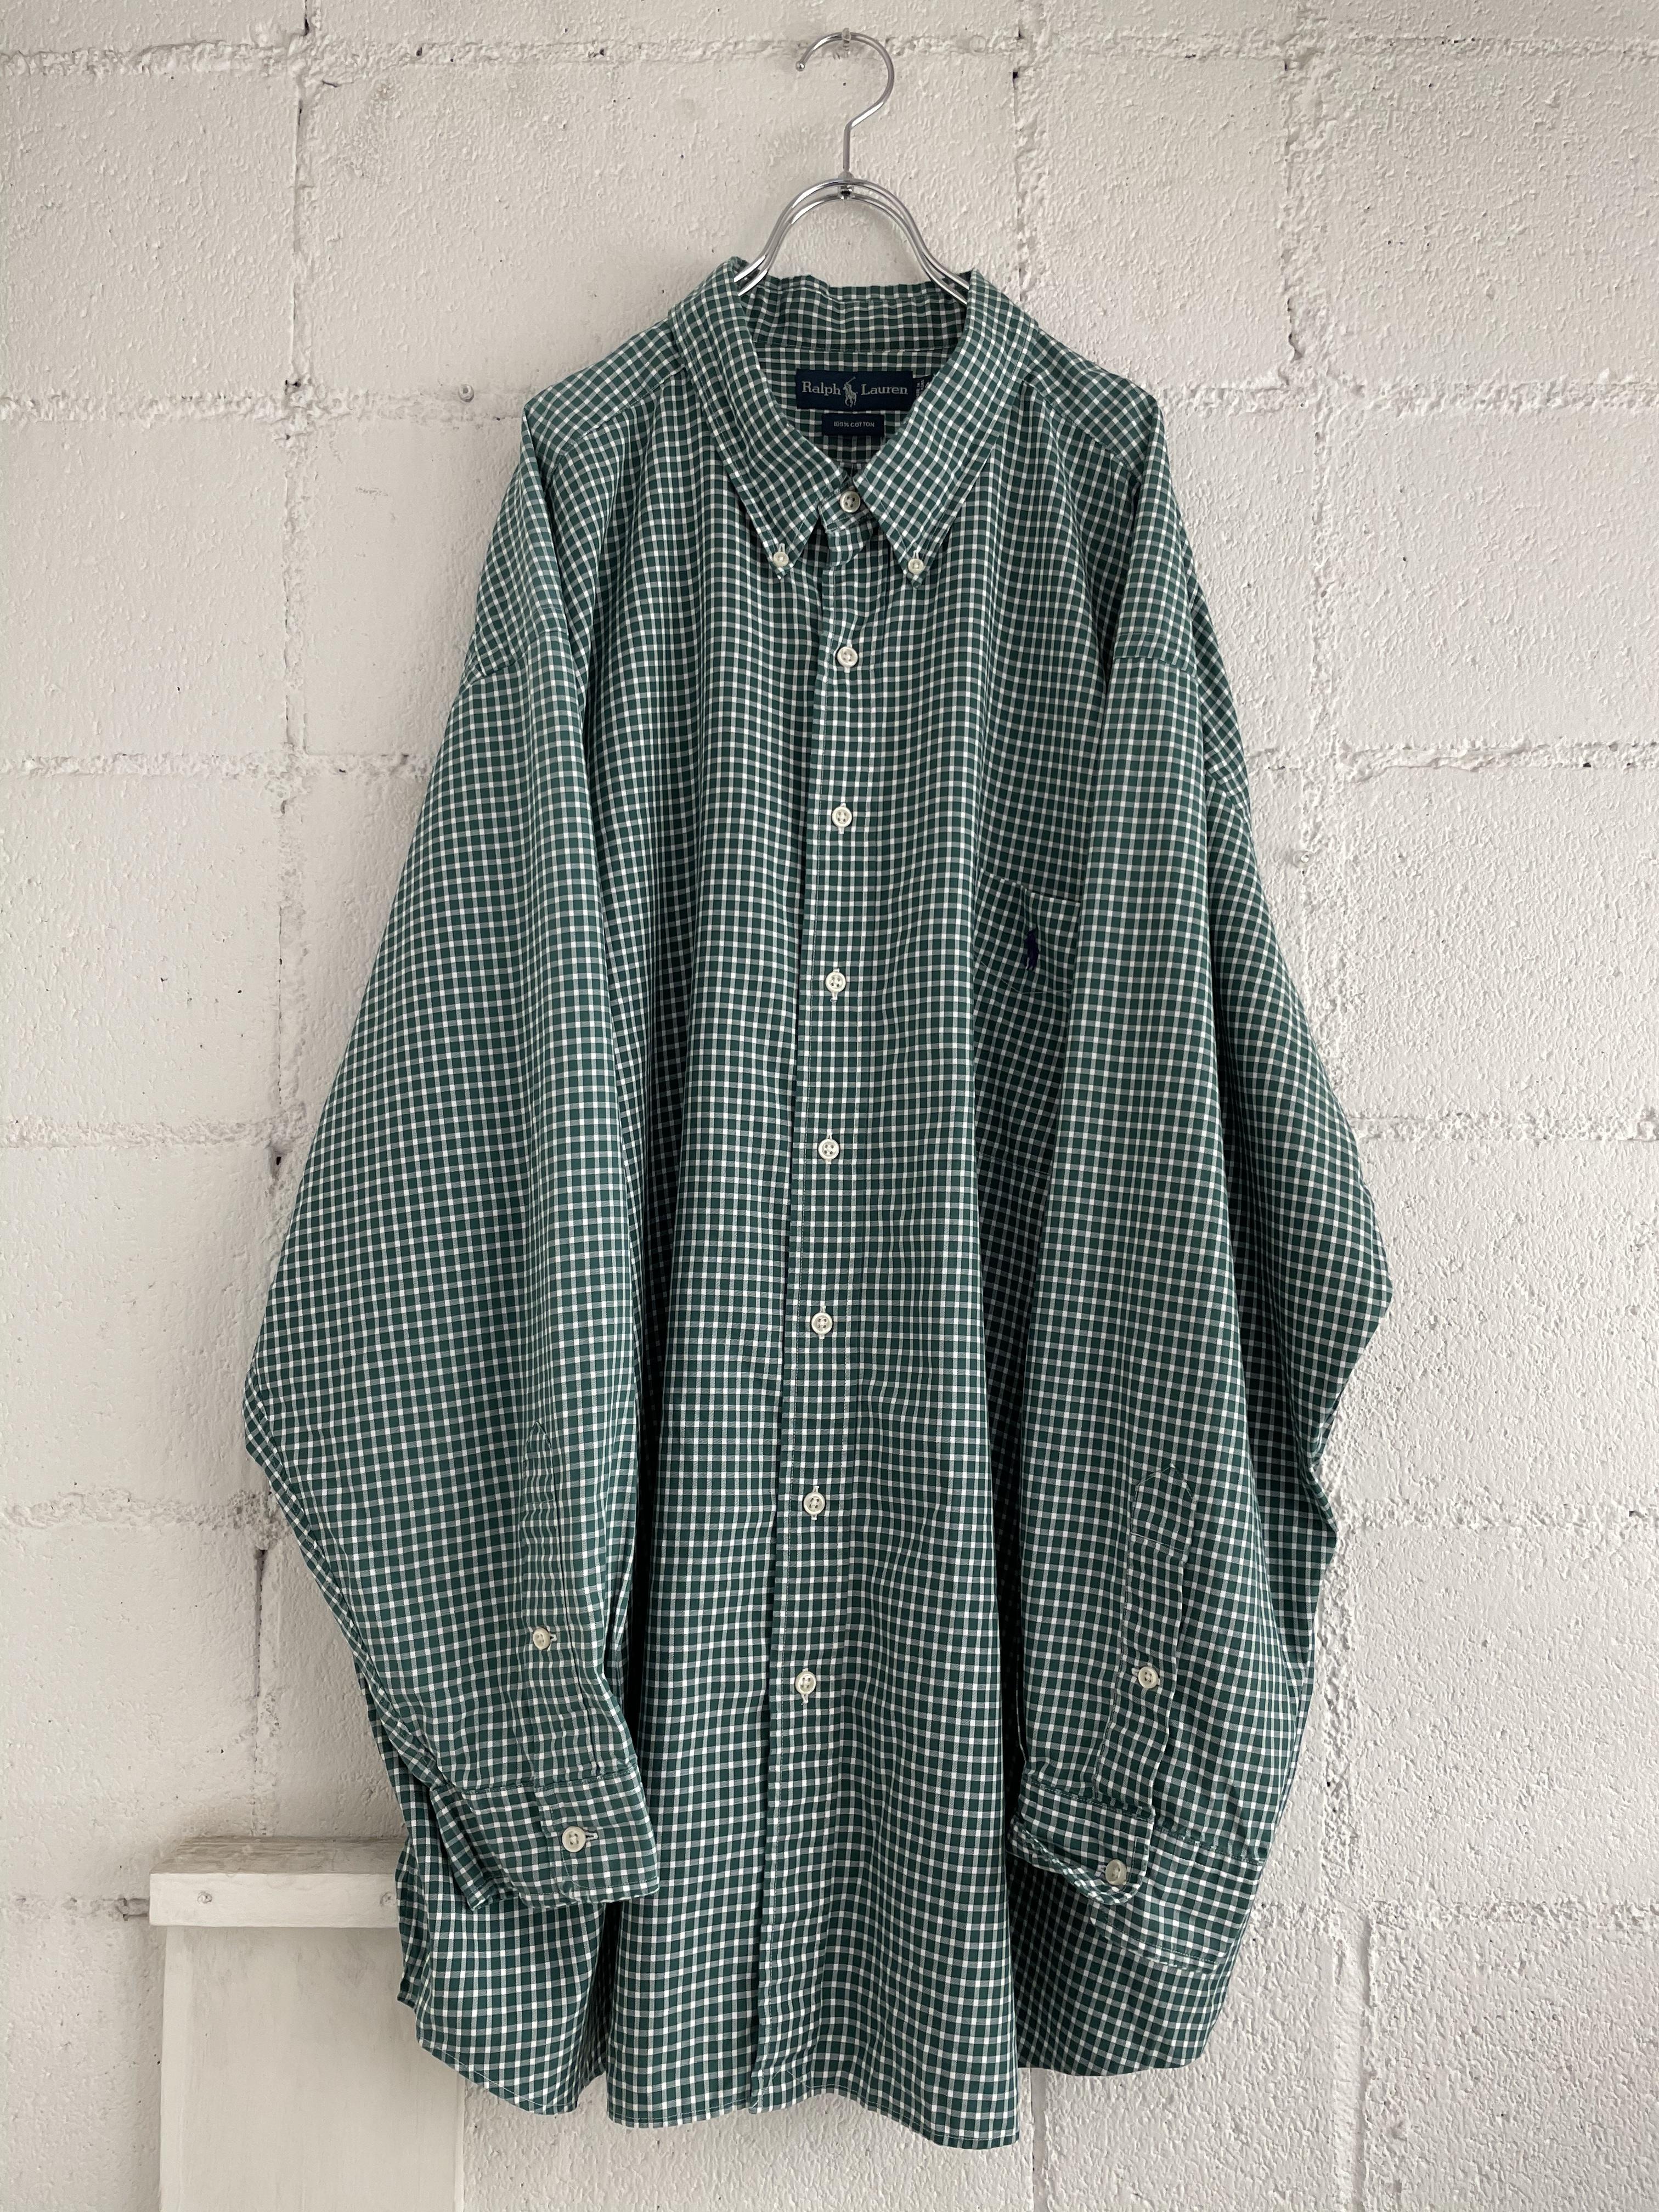 【USED】ralph lauren / オーバーサイズチェックシャツ